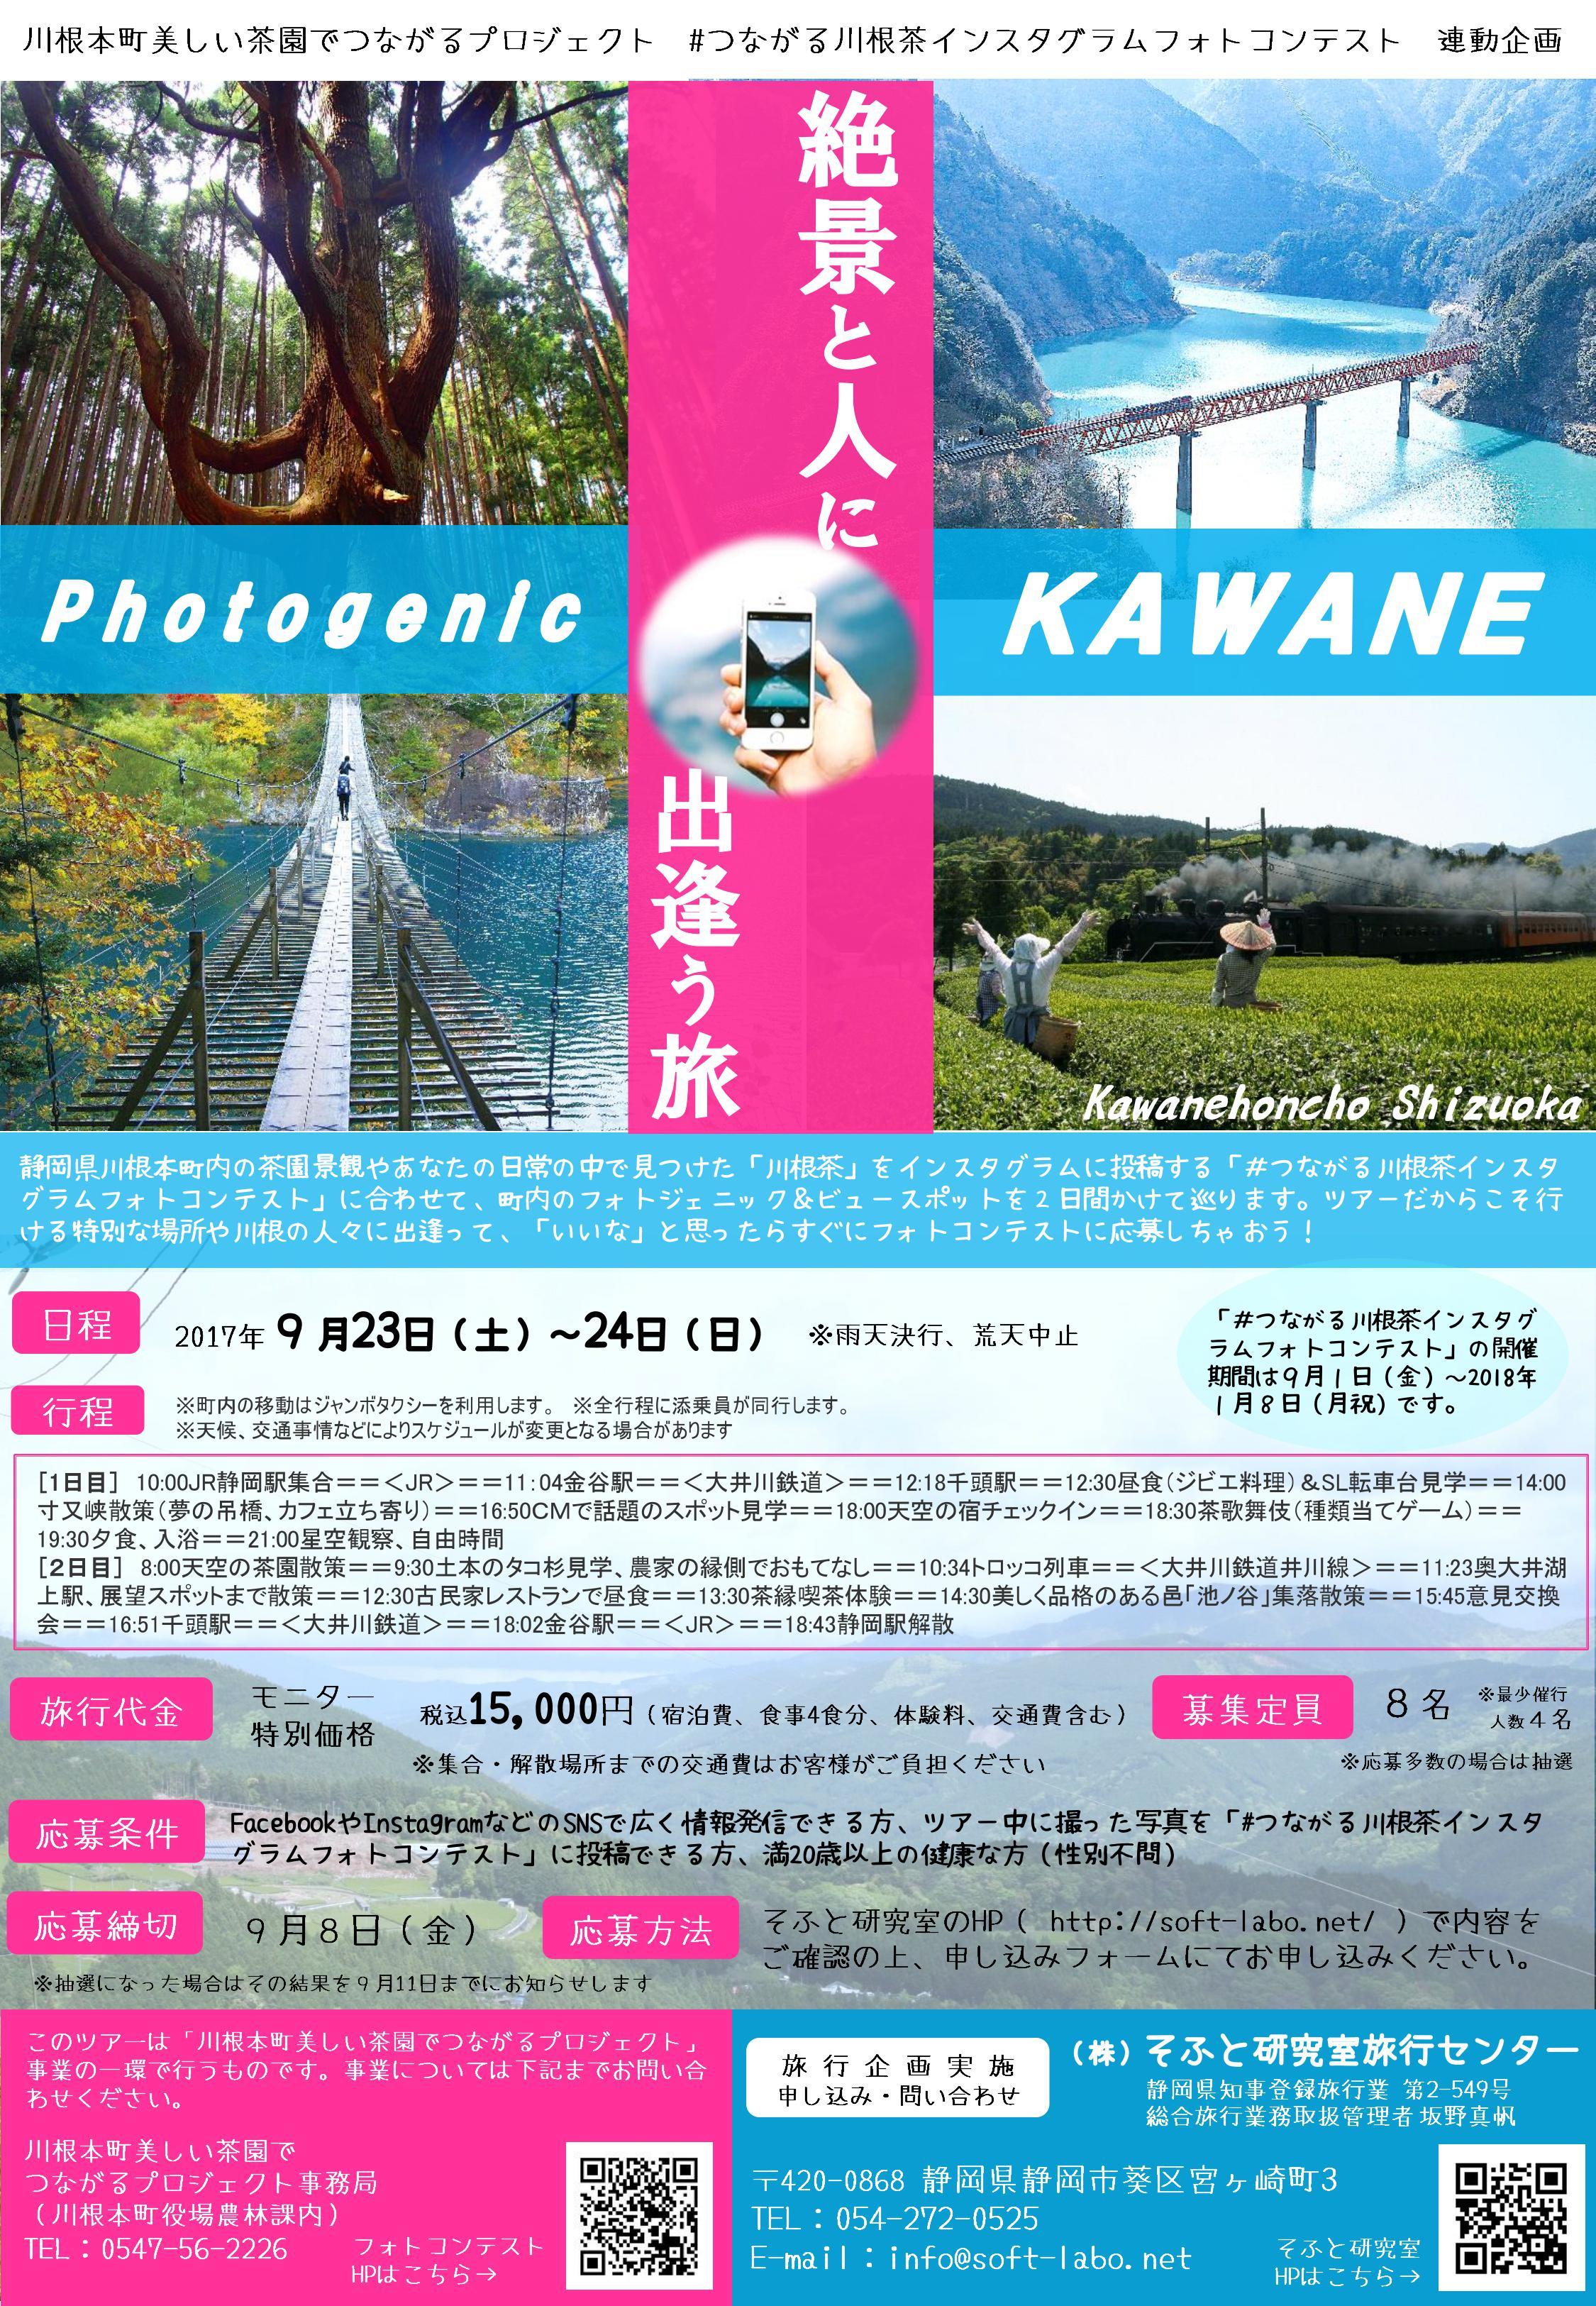 http://kawanehon-eco.com/wp-content/uploads/2017/08/0001s1.jpg